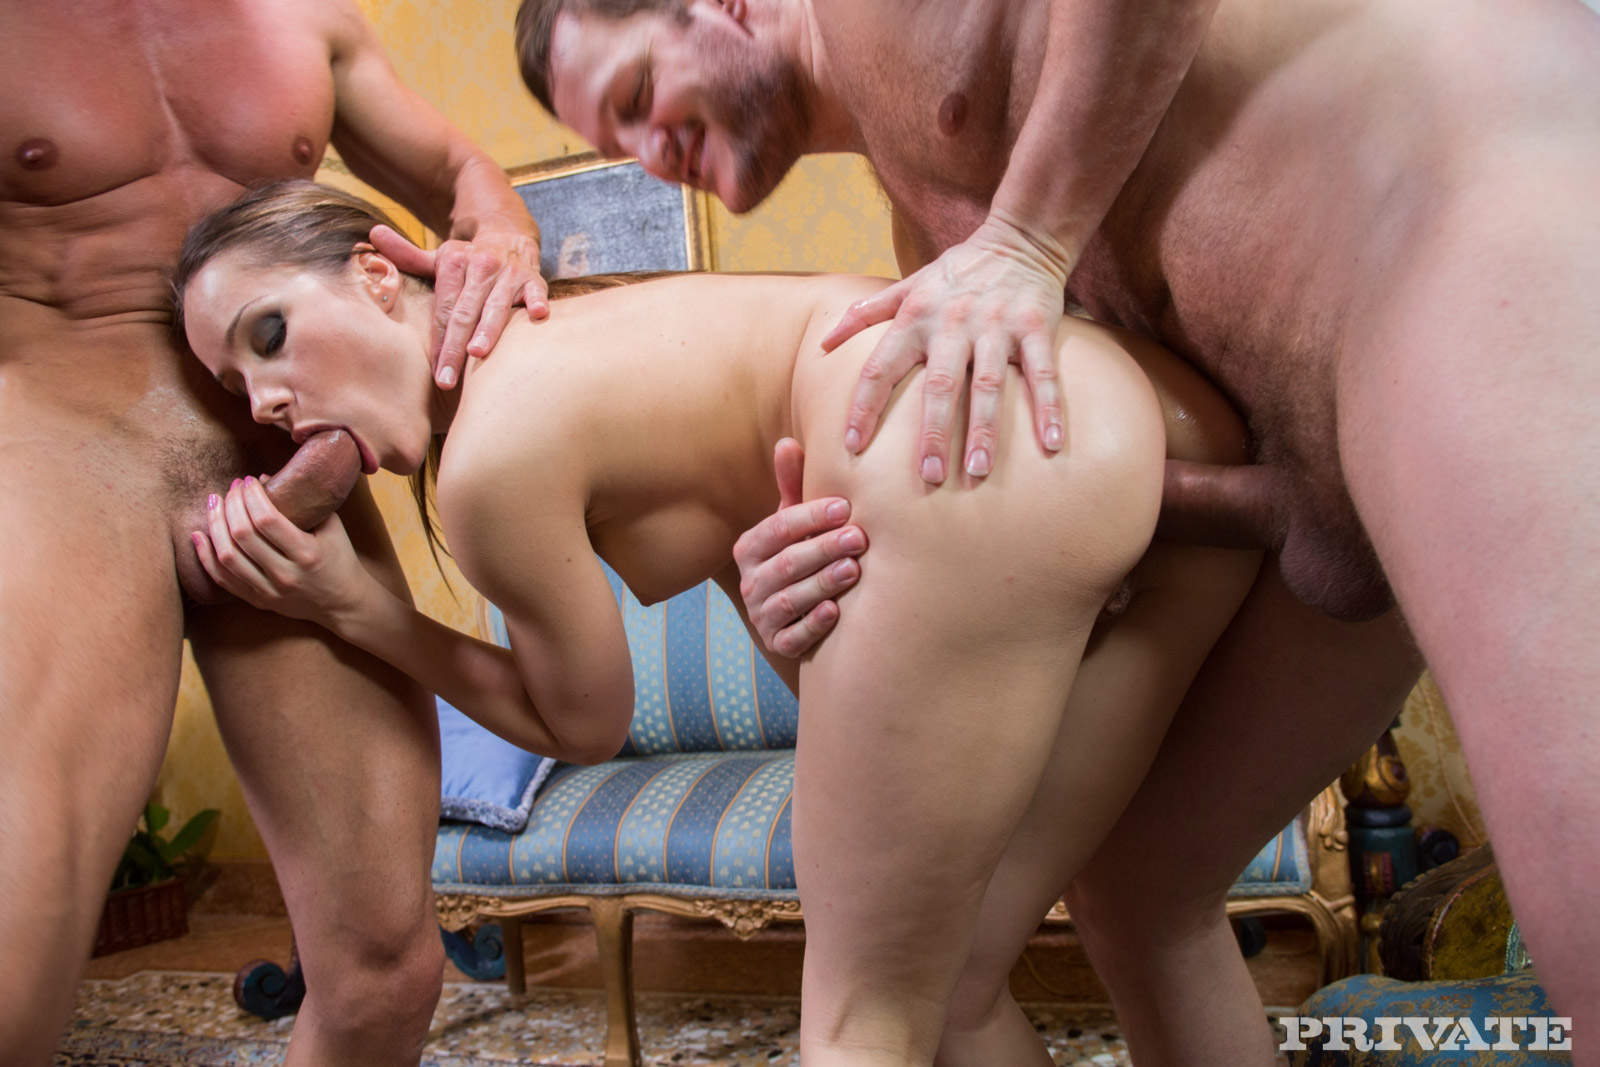 Порно онлайн оттрахали 71